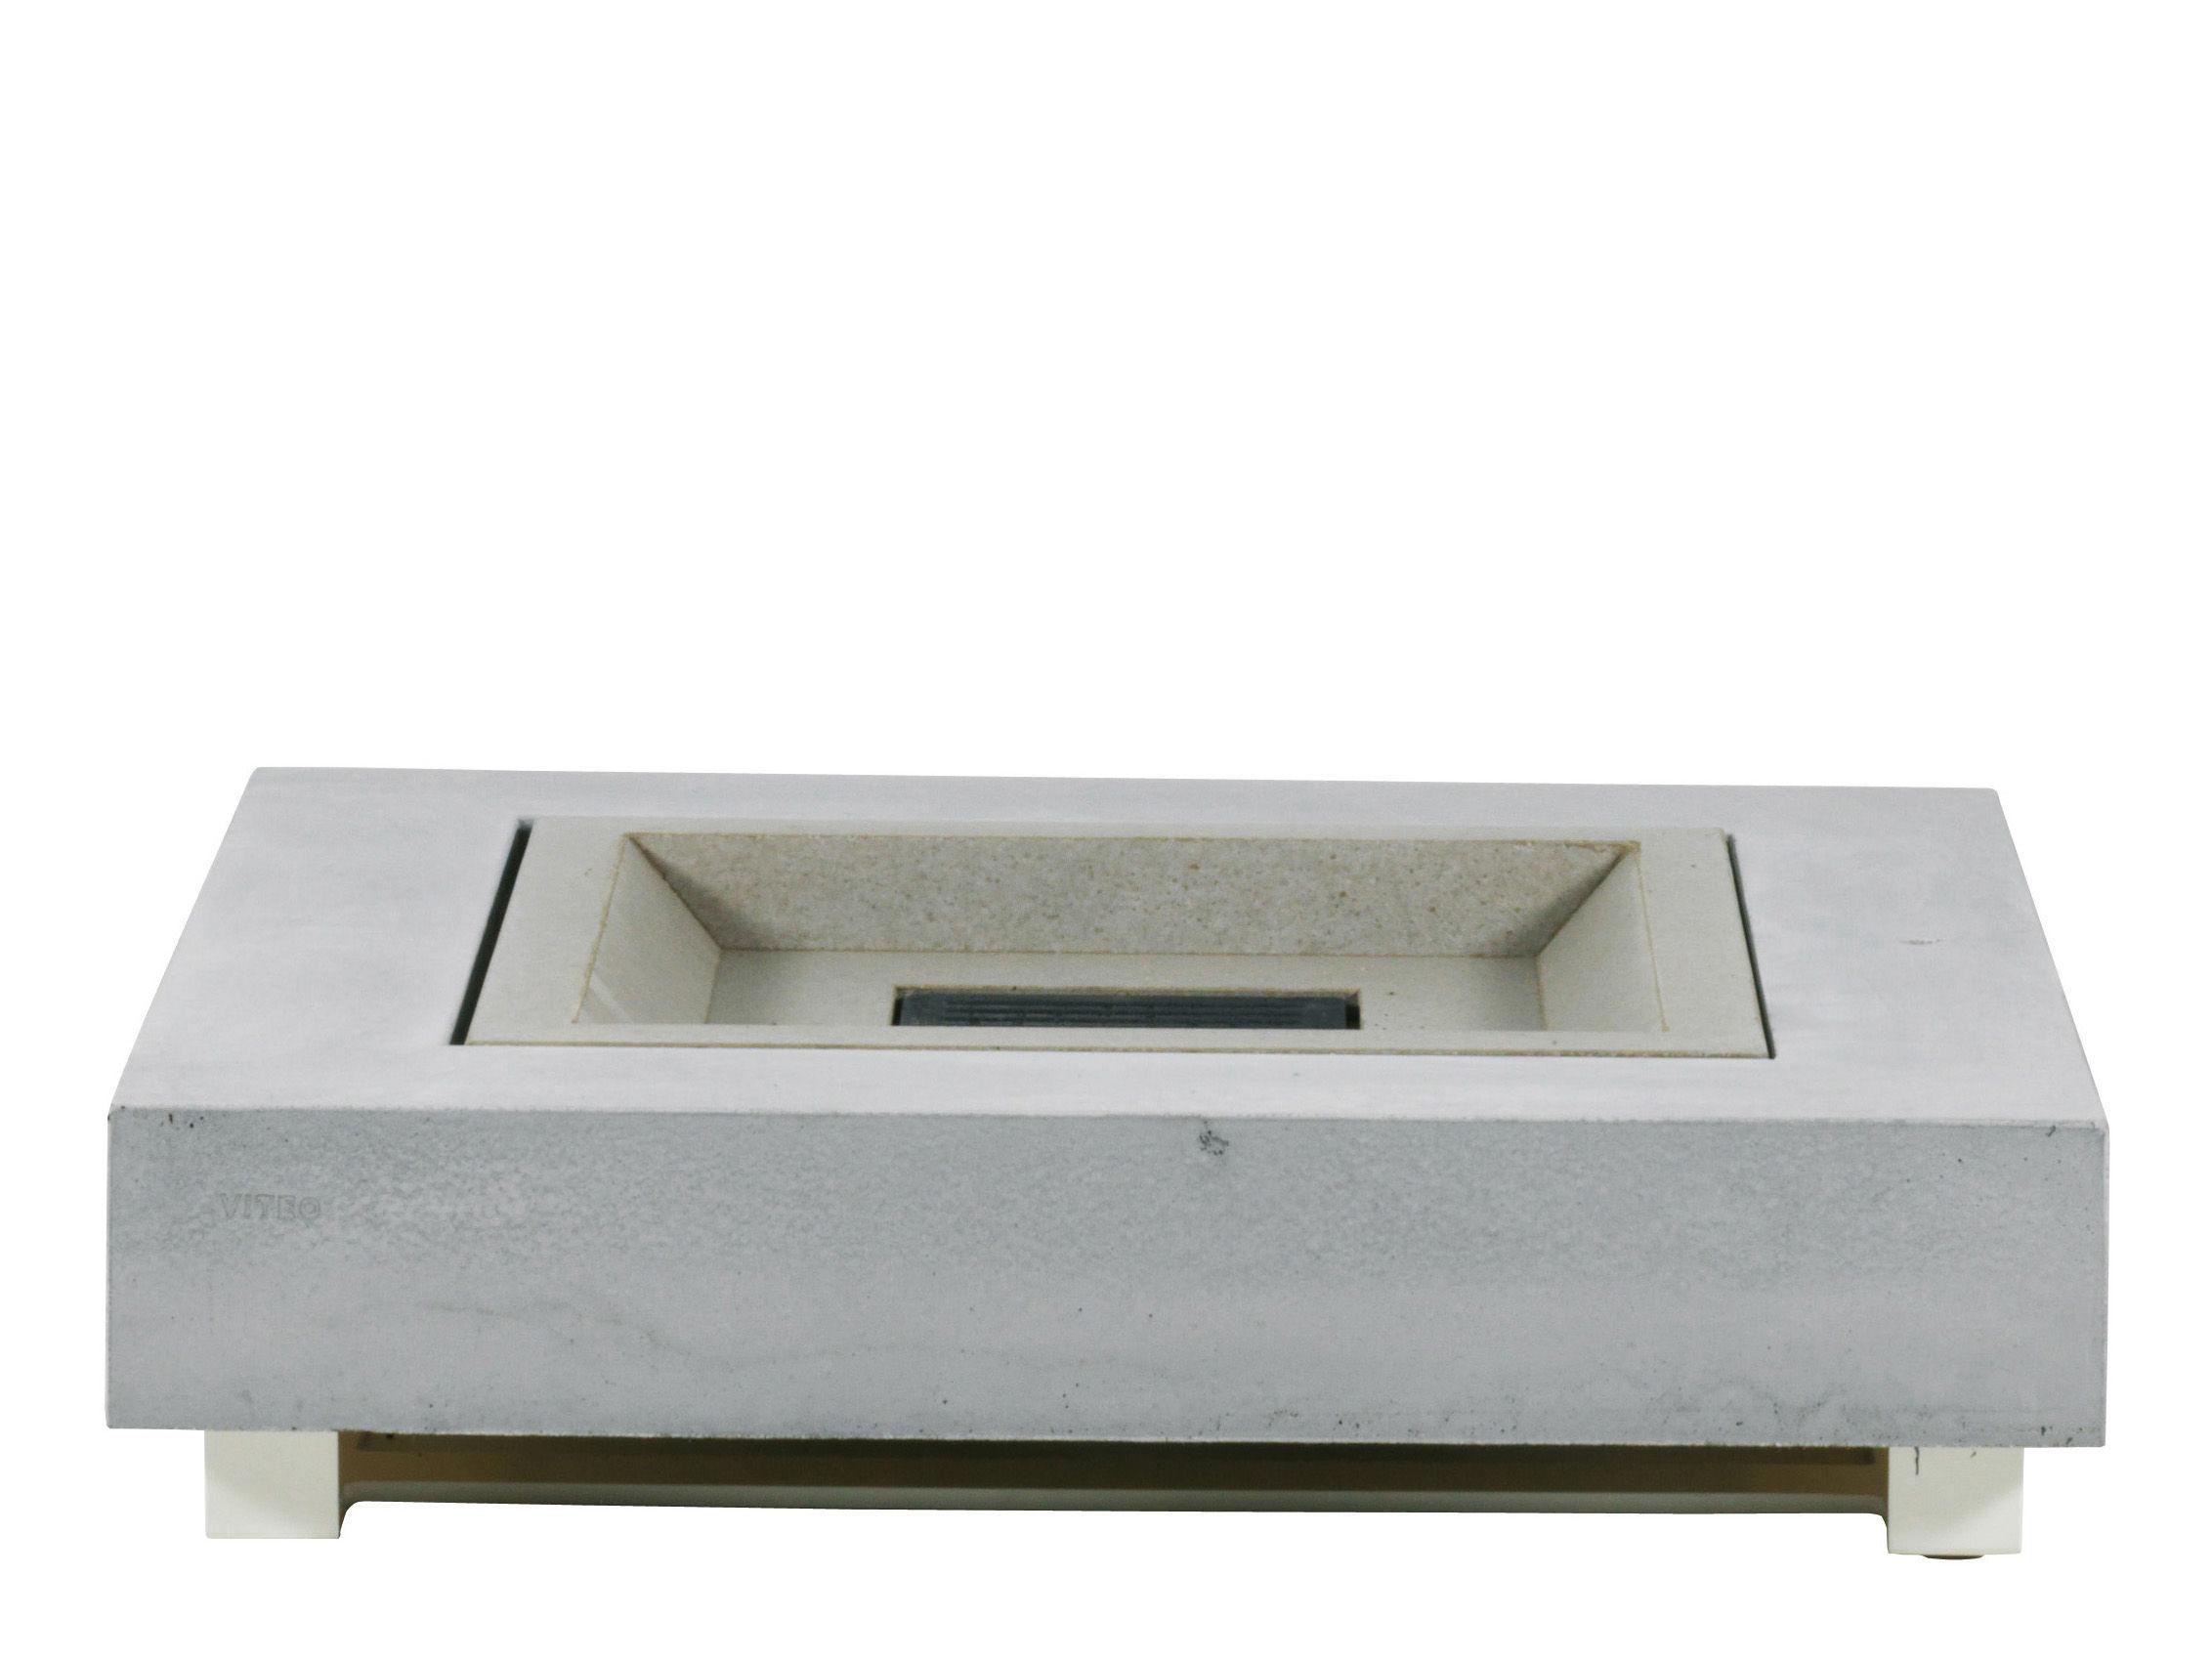 Outdoor Küche Viteo : Pure couchtisch feuertisch beton 90 x 90 cm lounge feuertisch